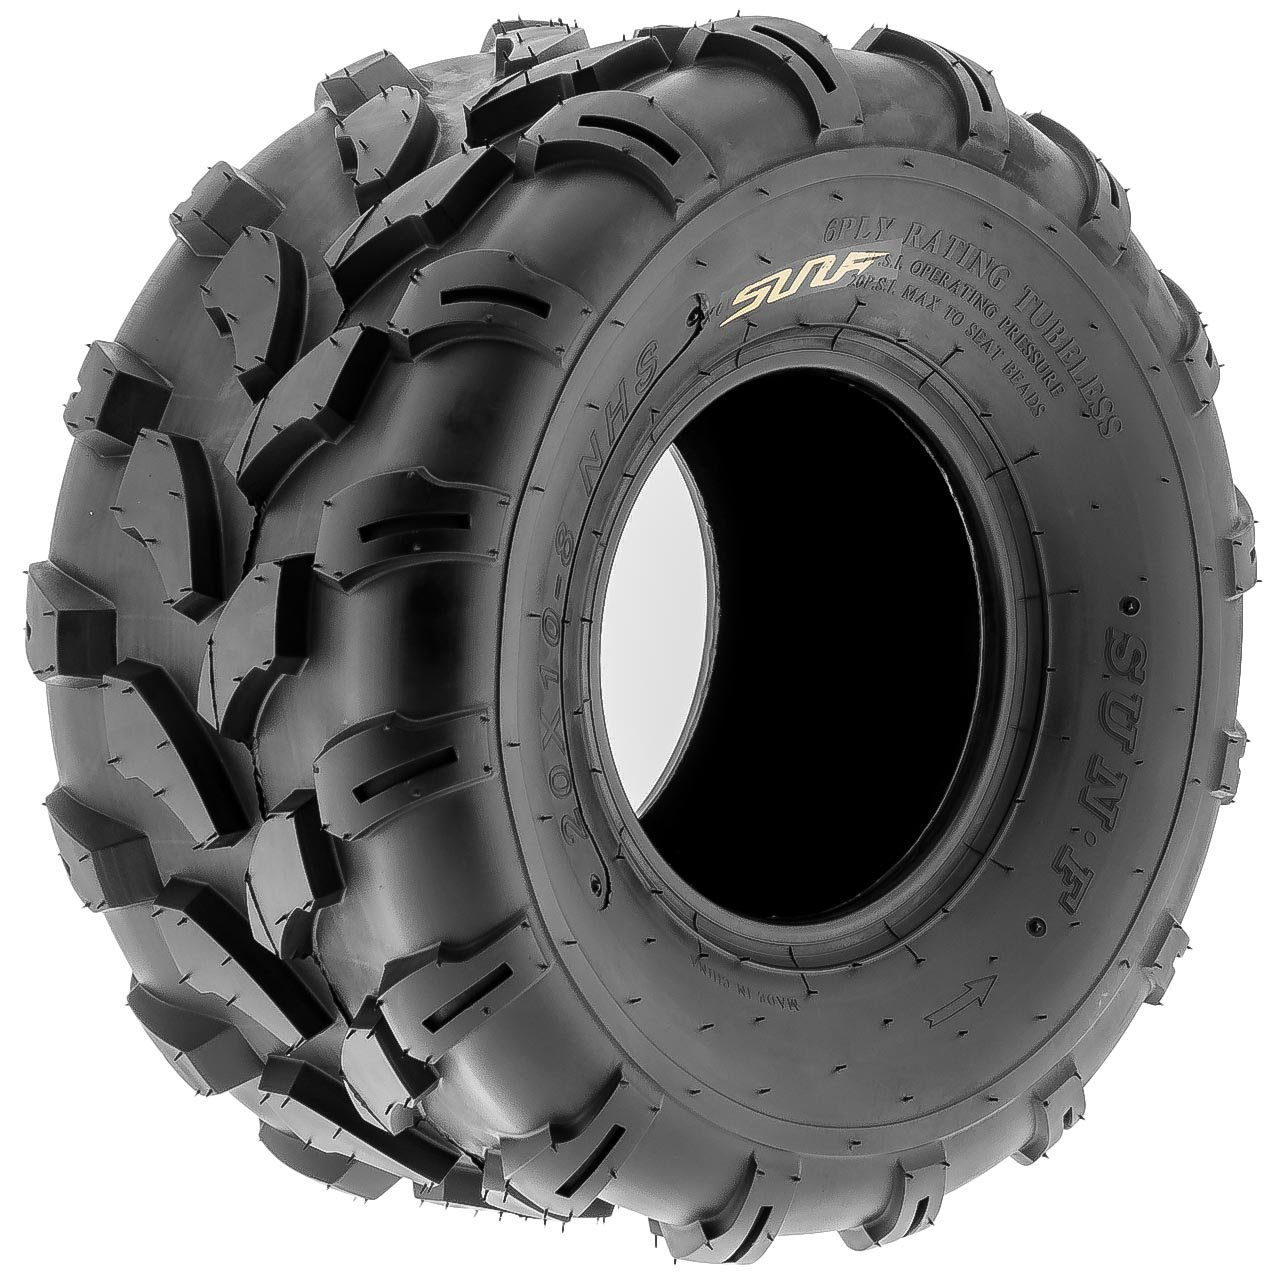 SunF A003 ATV/UTV/Lawn-Mowers Off-Road Tire 19x9.5-8, 6 PR, Directional Knobby Tread